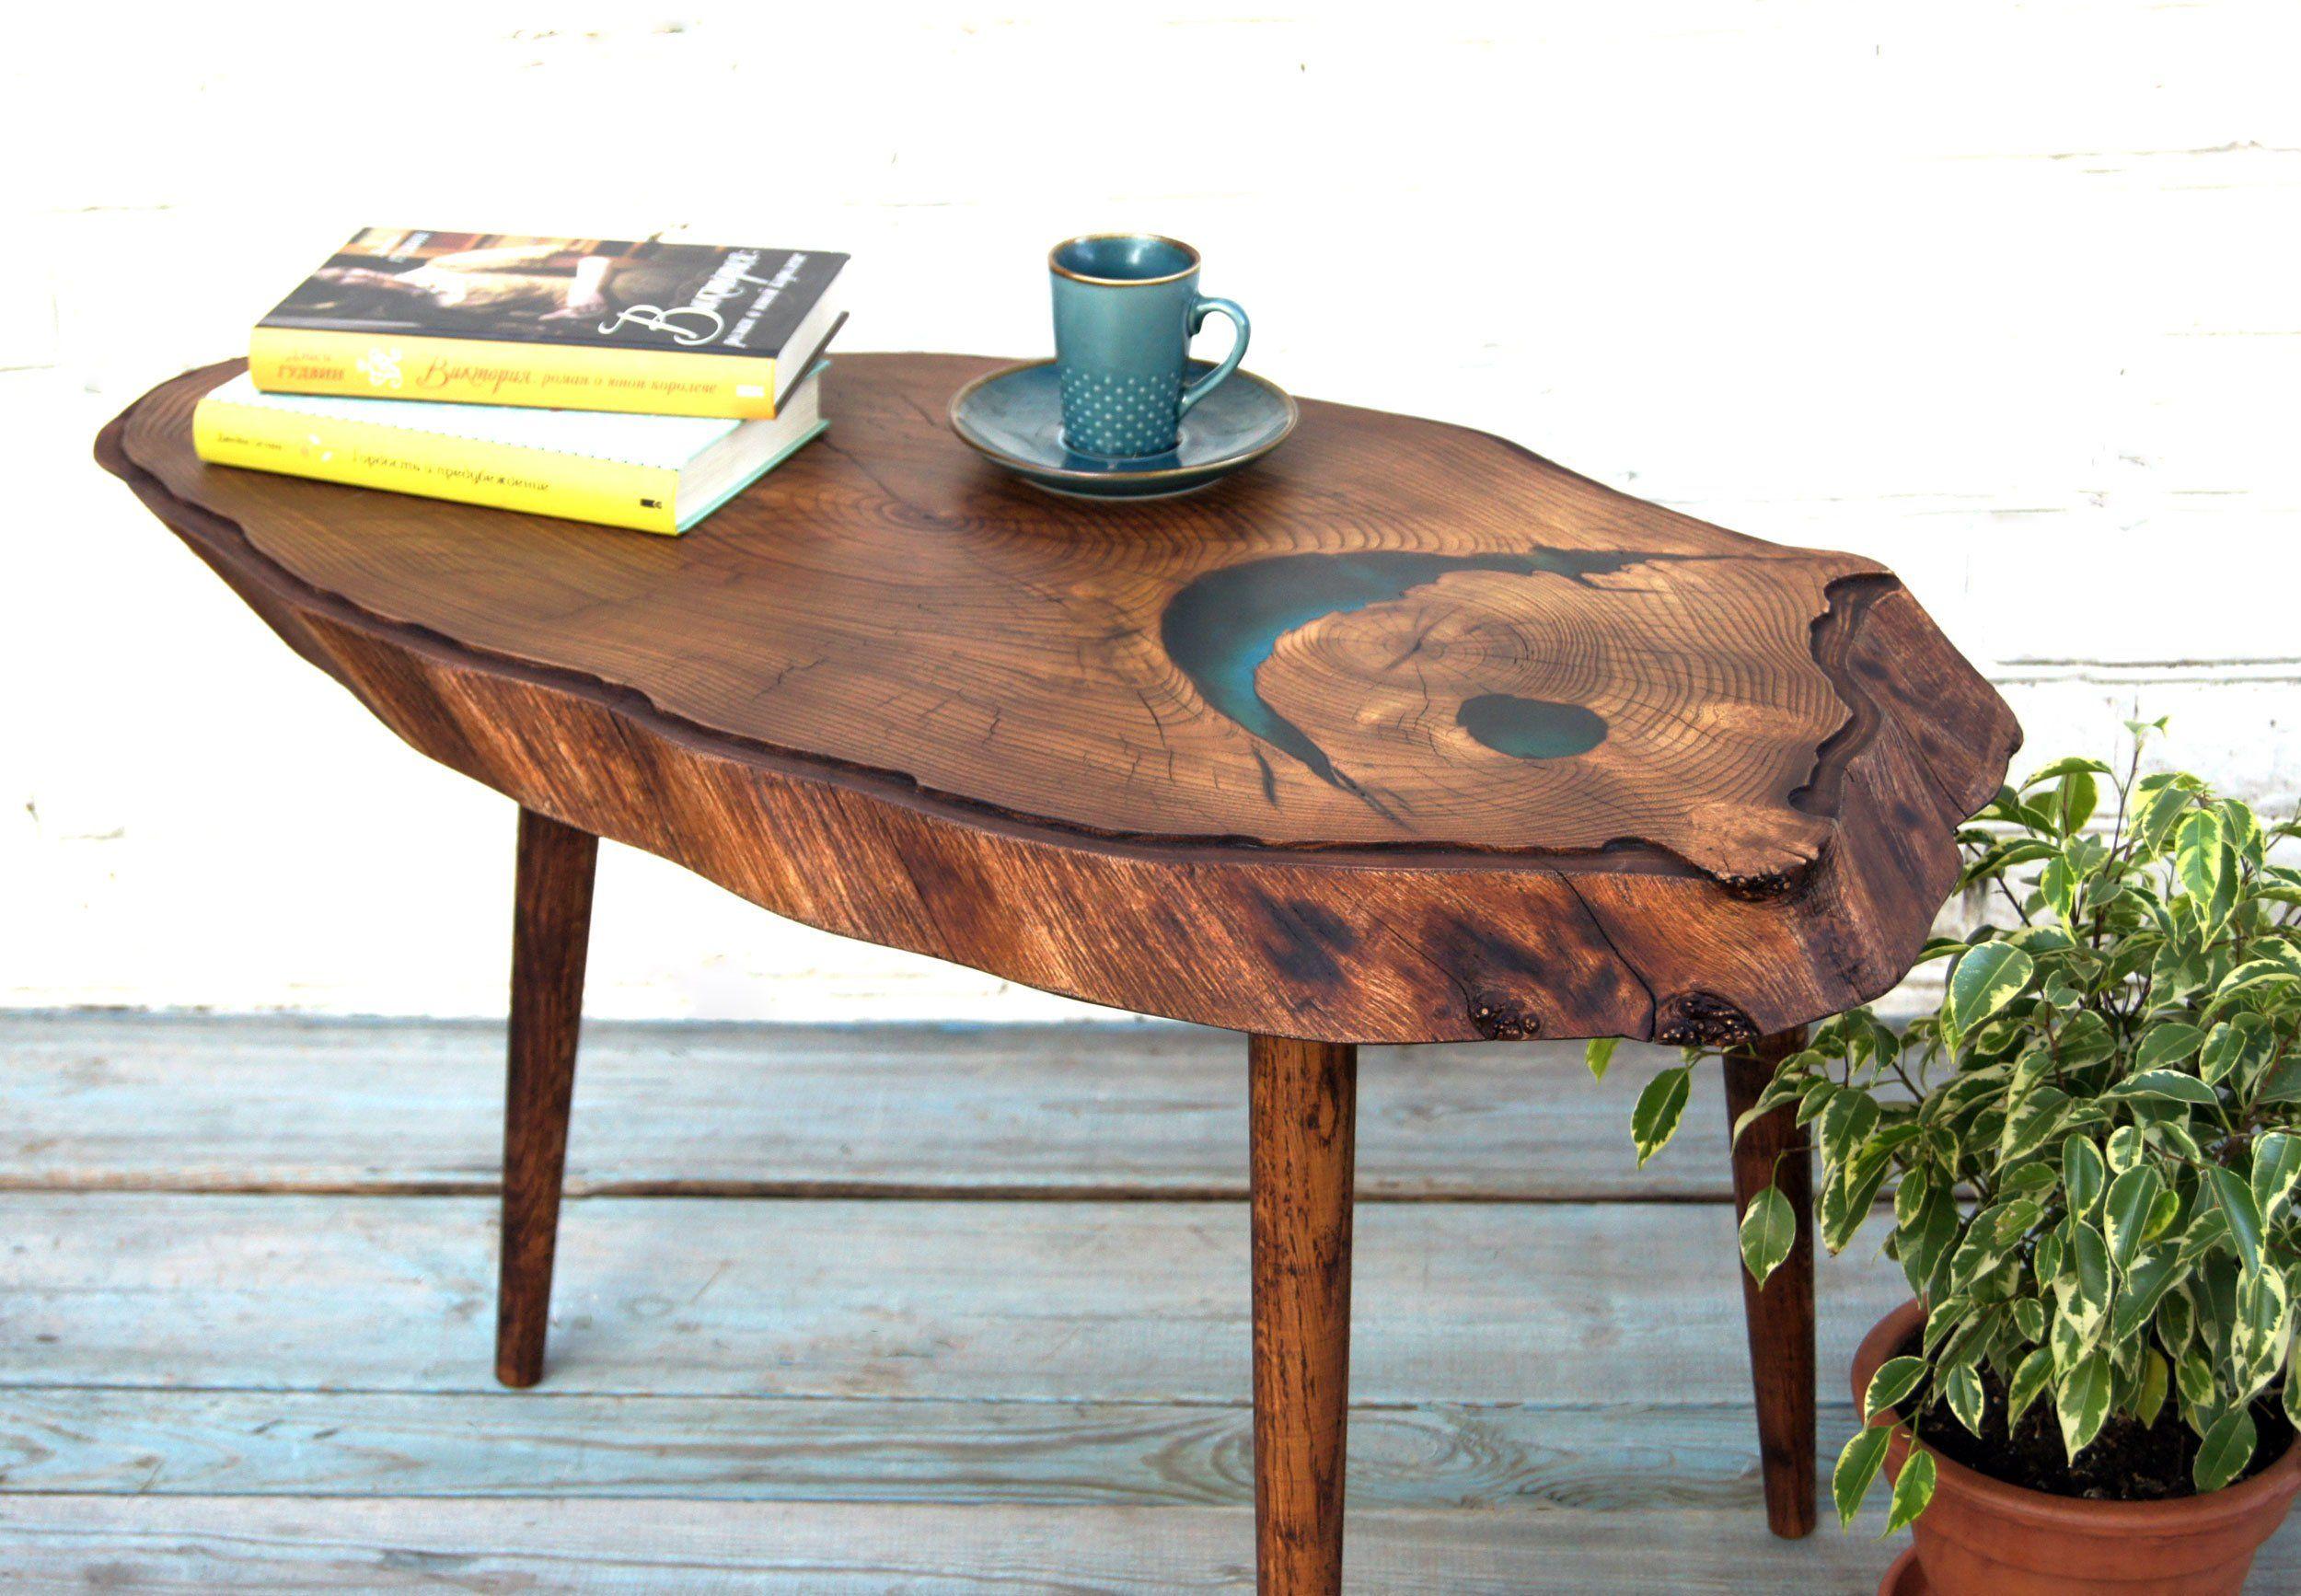 Large Epoxy Resin Coffee Table Live Edge Wood Slab Table Etsy Burled Wood Coffee Table Wood Natural Wood Coffee Table [ 1734 x 2500 Pixel ]